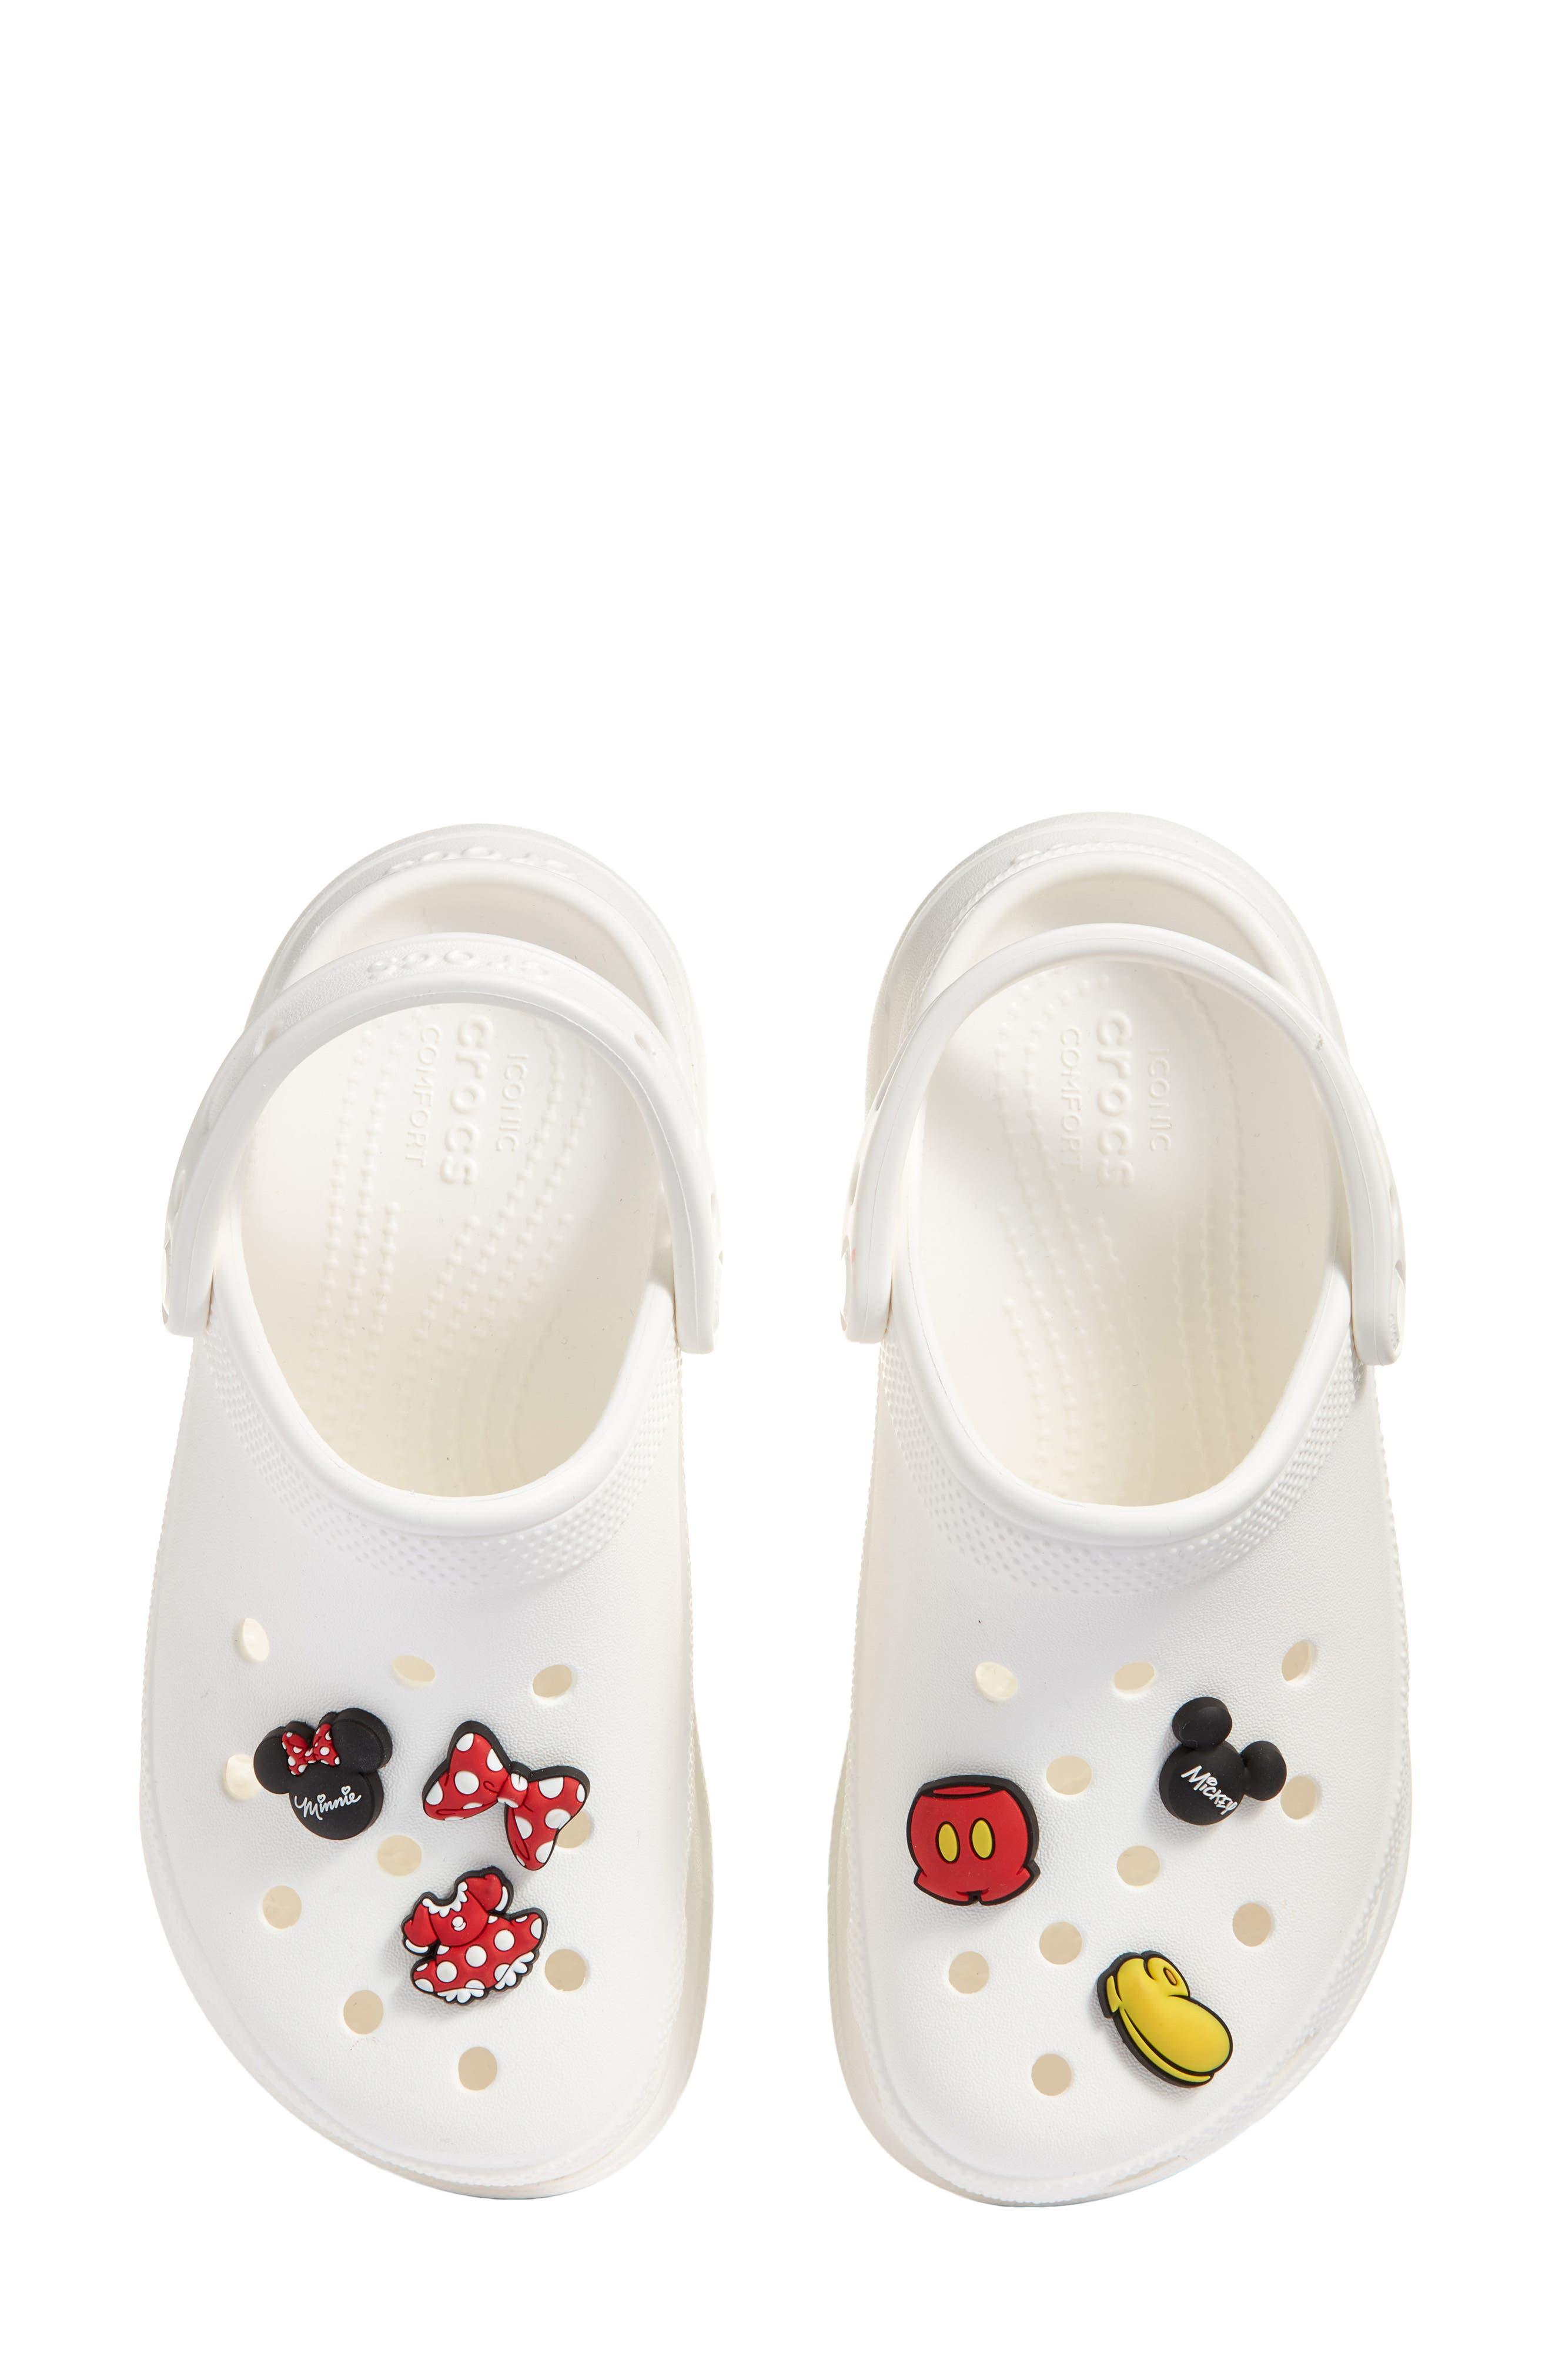 Disney X Crocs(TM) Bae Clog & 6-Pack Mickey & Minnie Jibbitz Shoe Charms